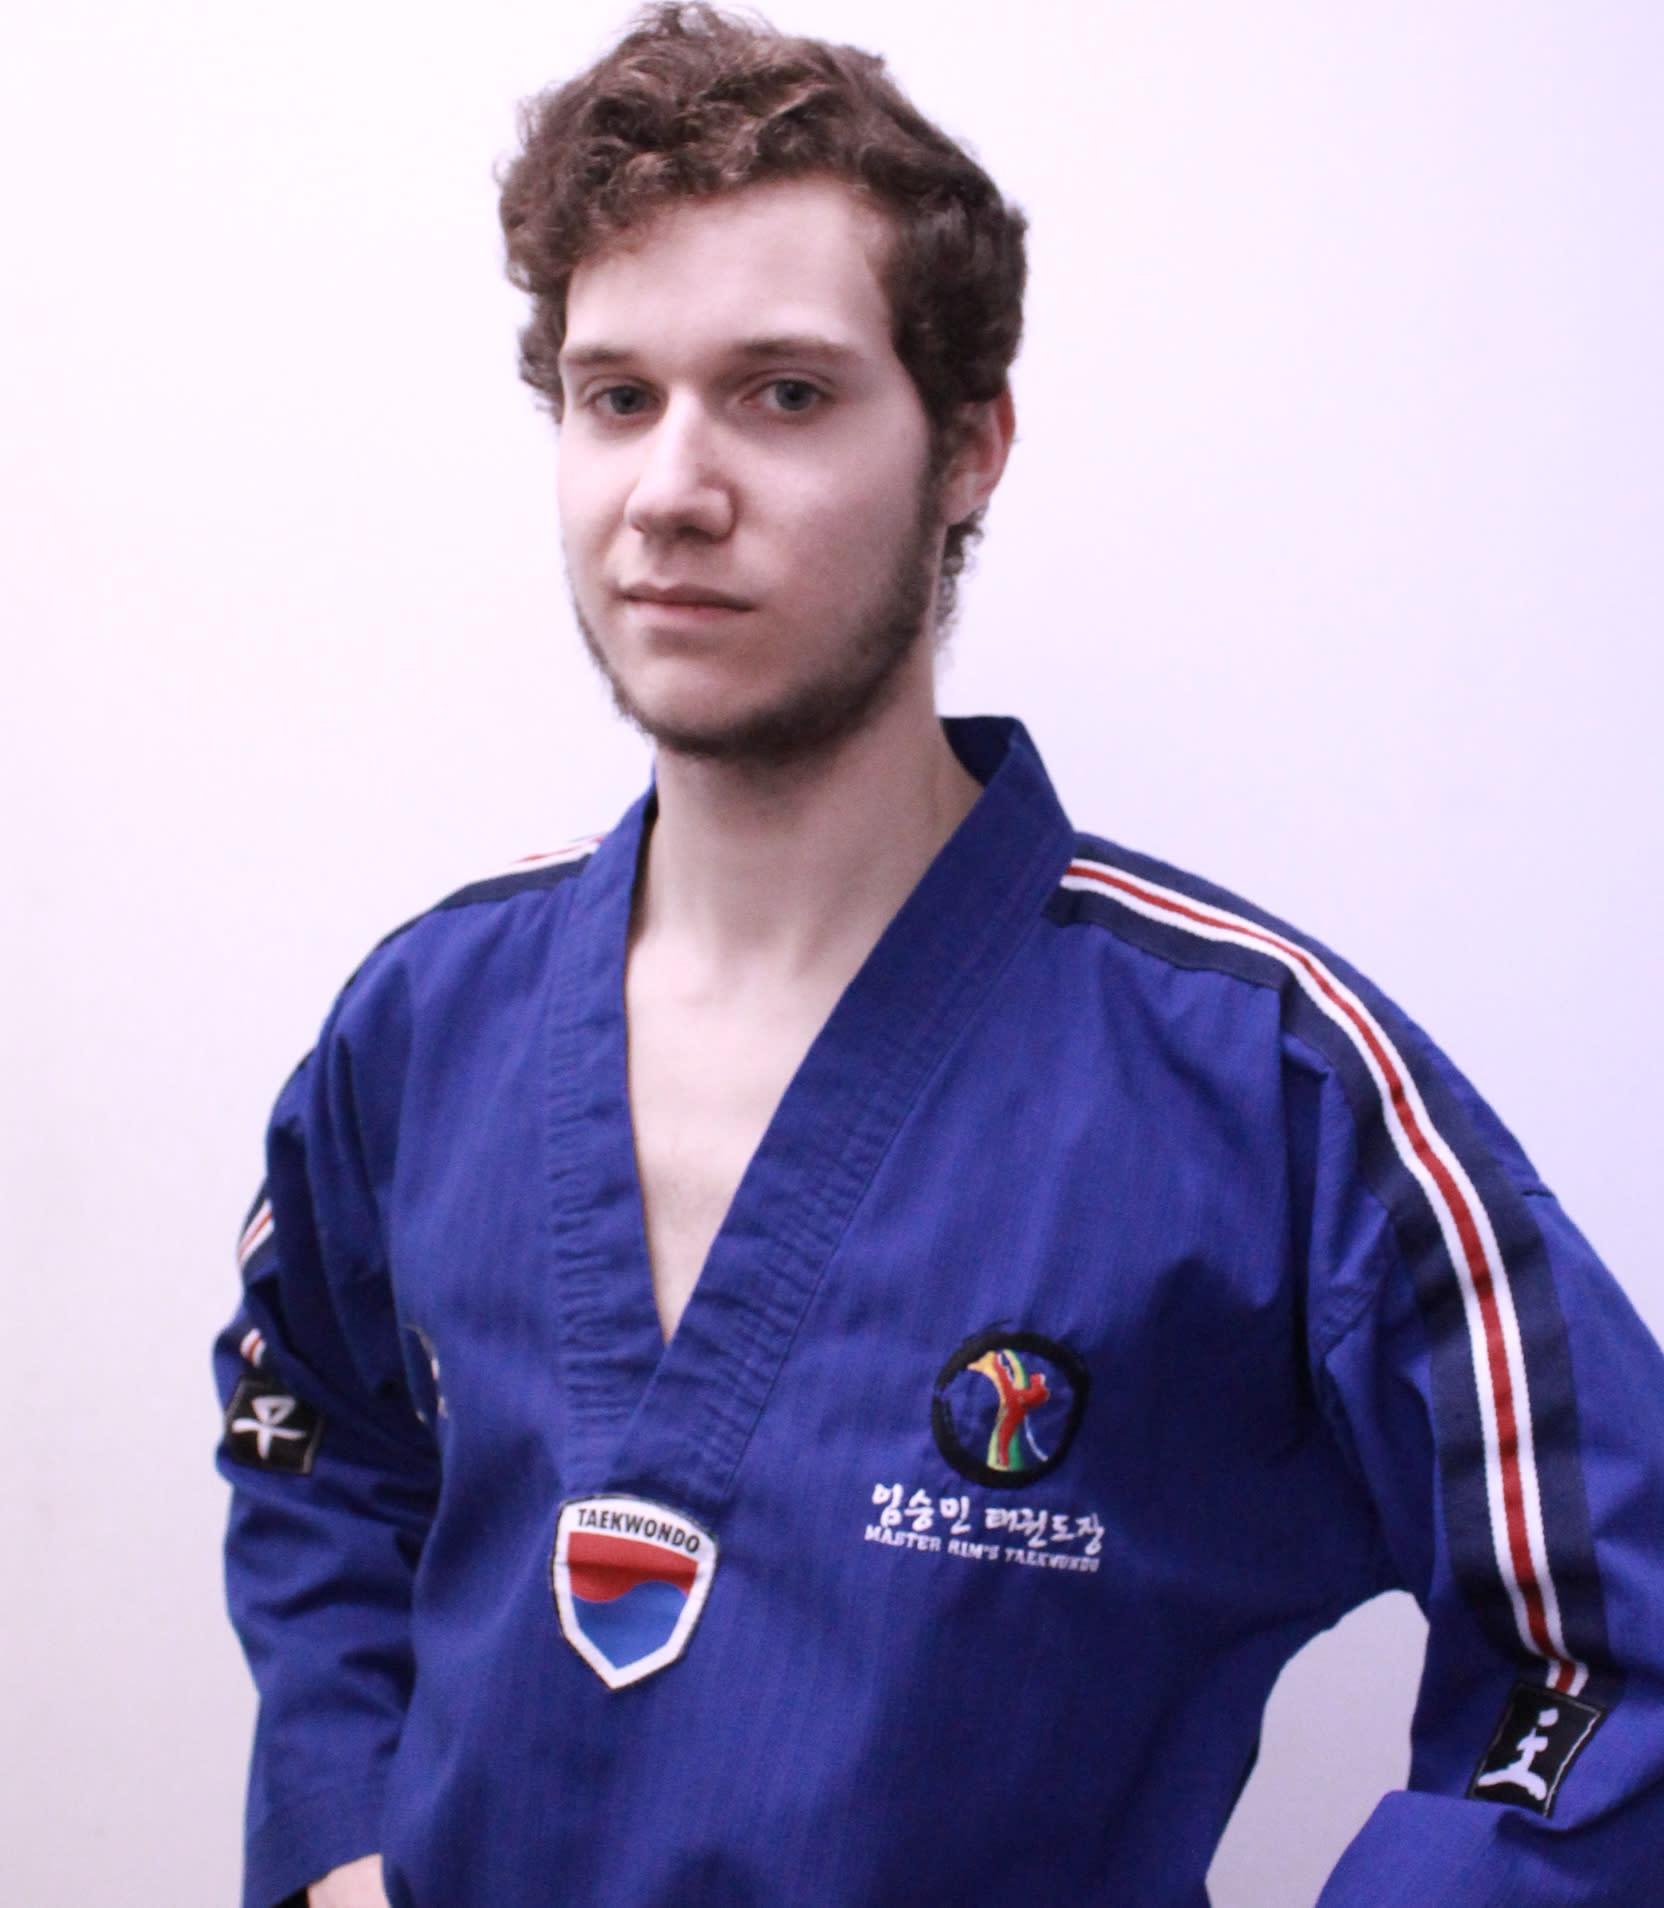 Instructor Liam  in Calgary - Master Rim's Taekwondo